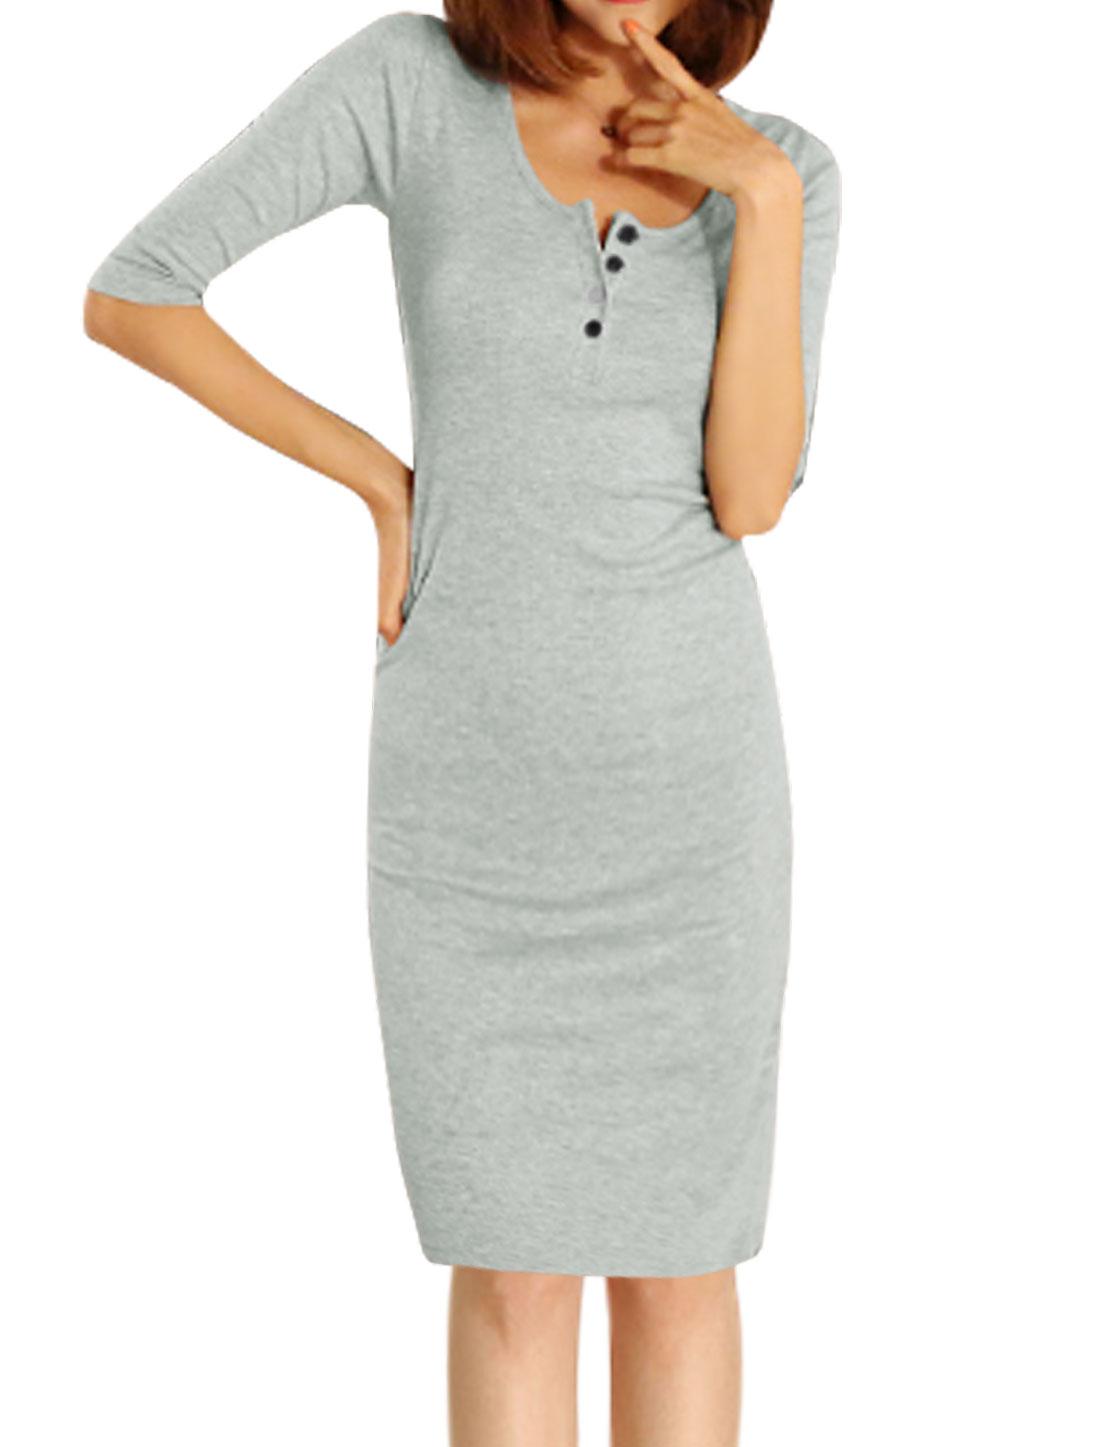 Women Half Button Closure 1/2 Sleeves Sheath Dress Light Gray S